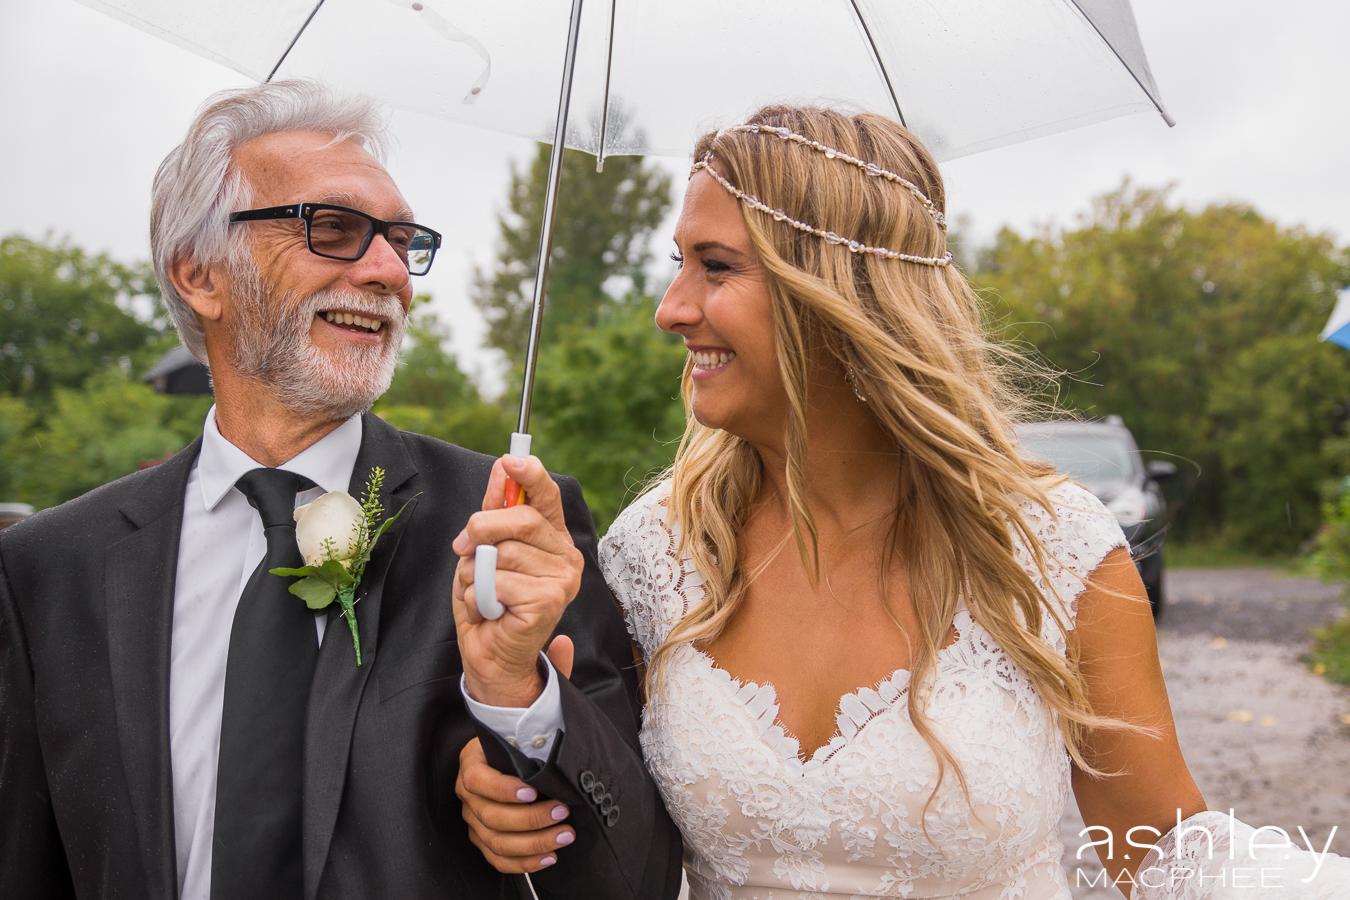 Ashley MacPhee Photography Hudson Yacht Club wedding photographer (26 of 112).jpg